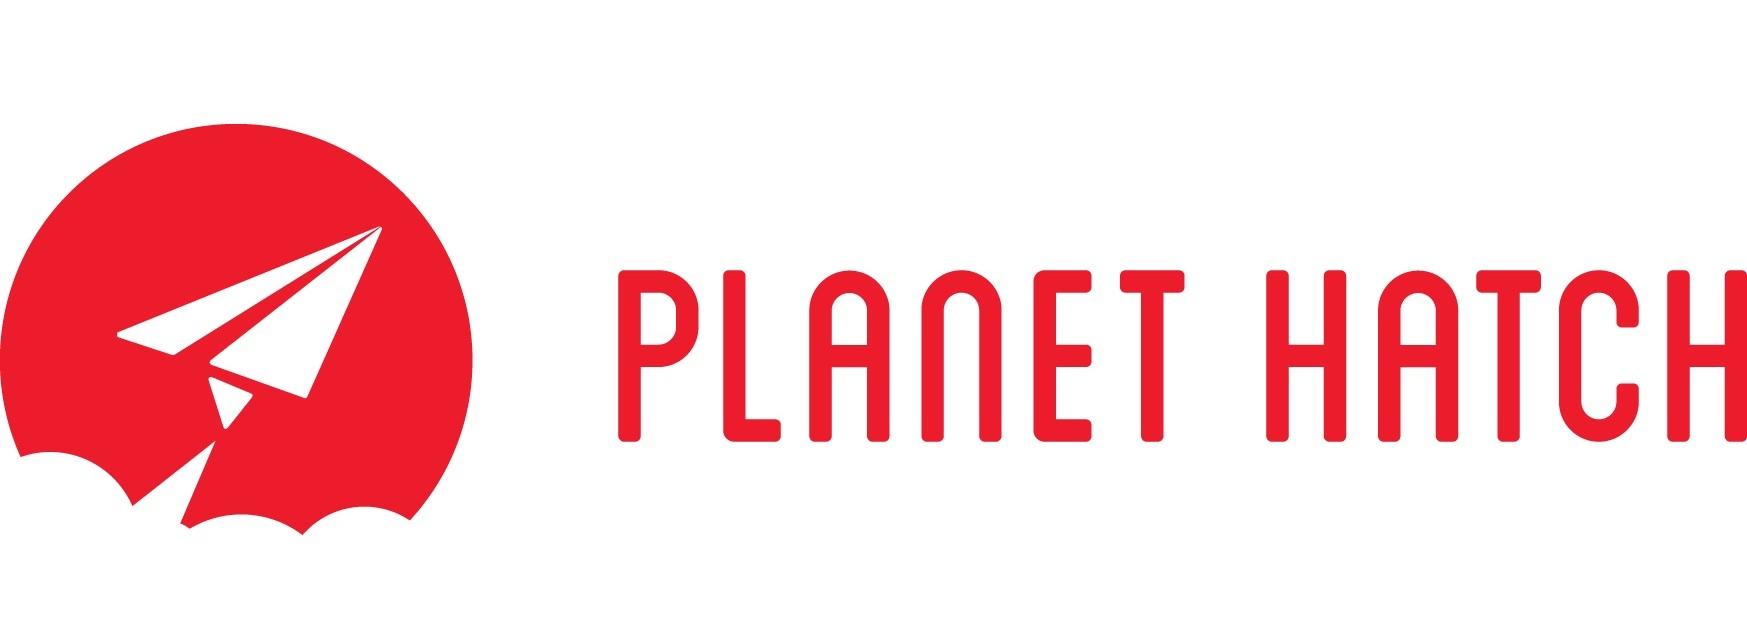 planethatch.jpg